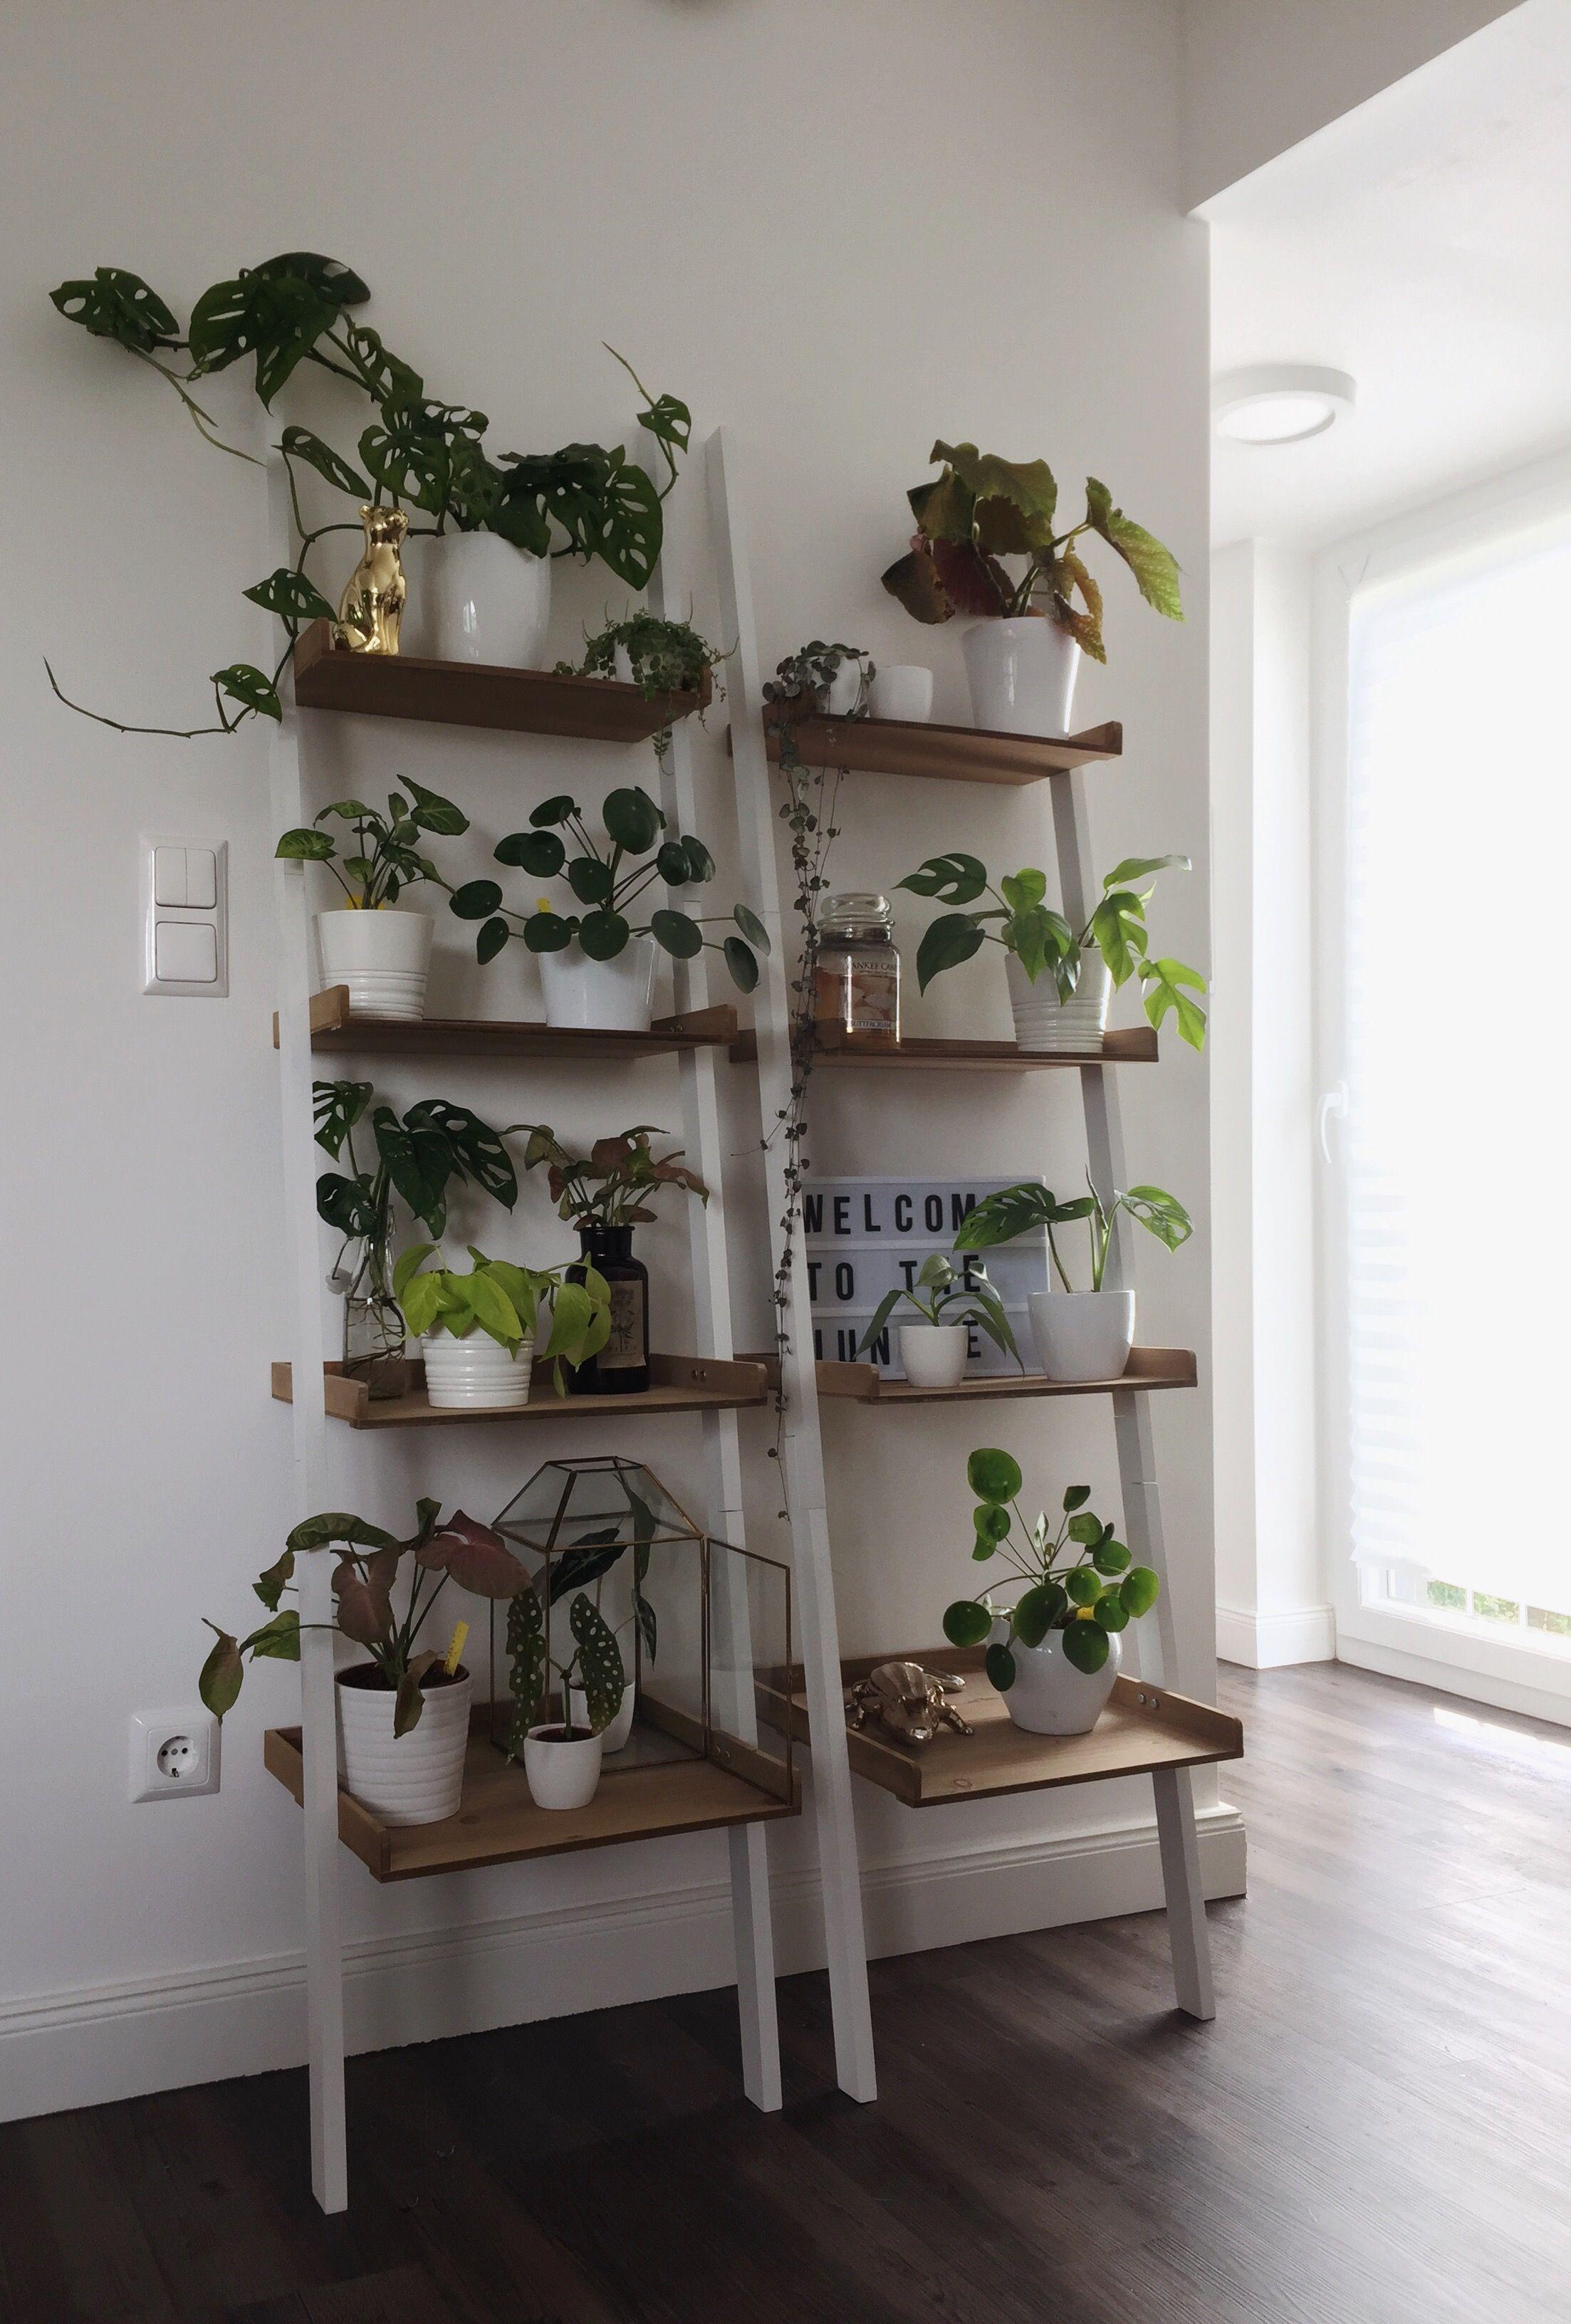 Pflanzenregal plantshelf  Decor, Interior, Home decor